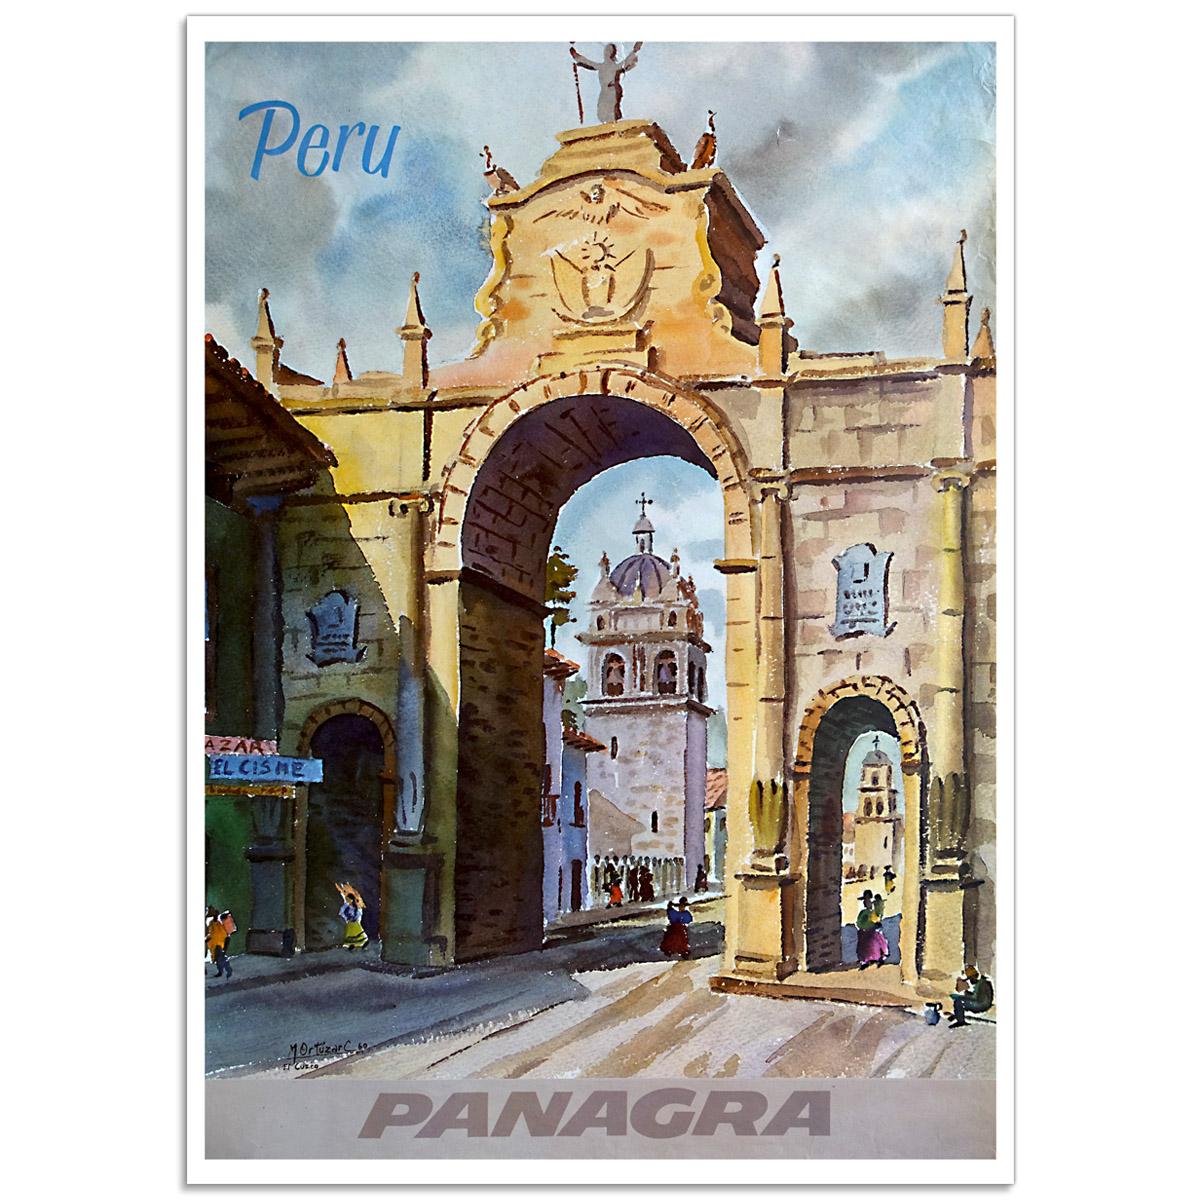 Vintage Travel Poster - Peru, Fly Panagra